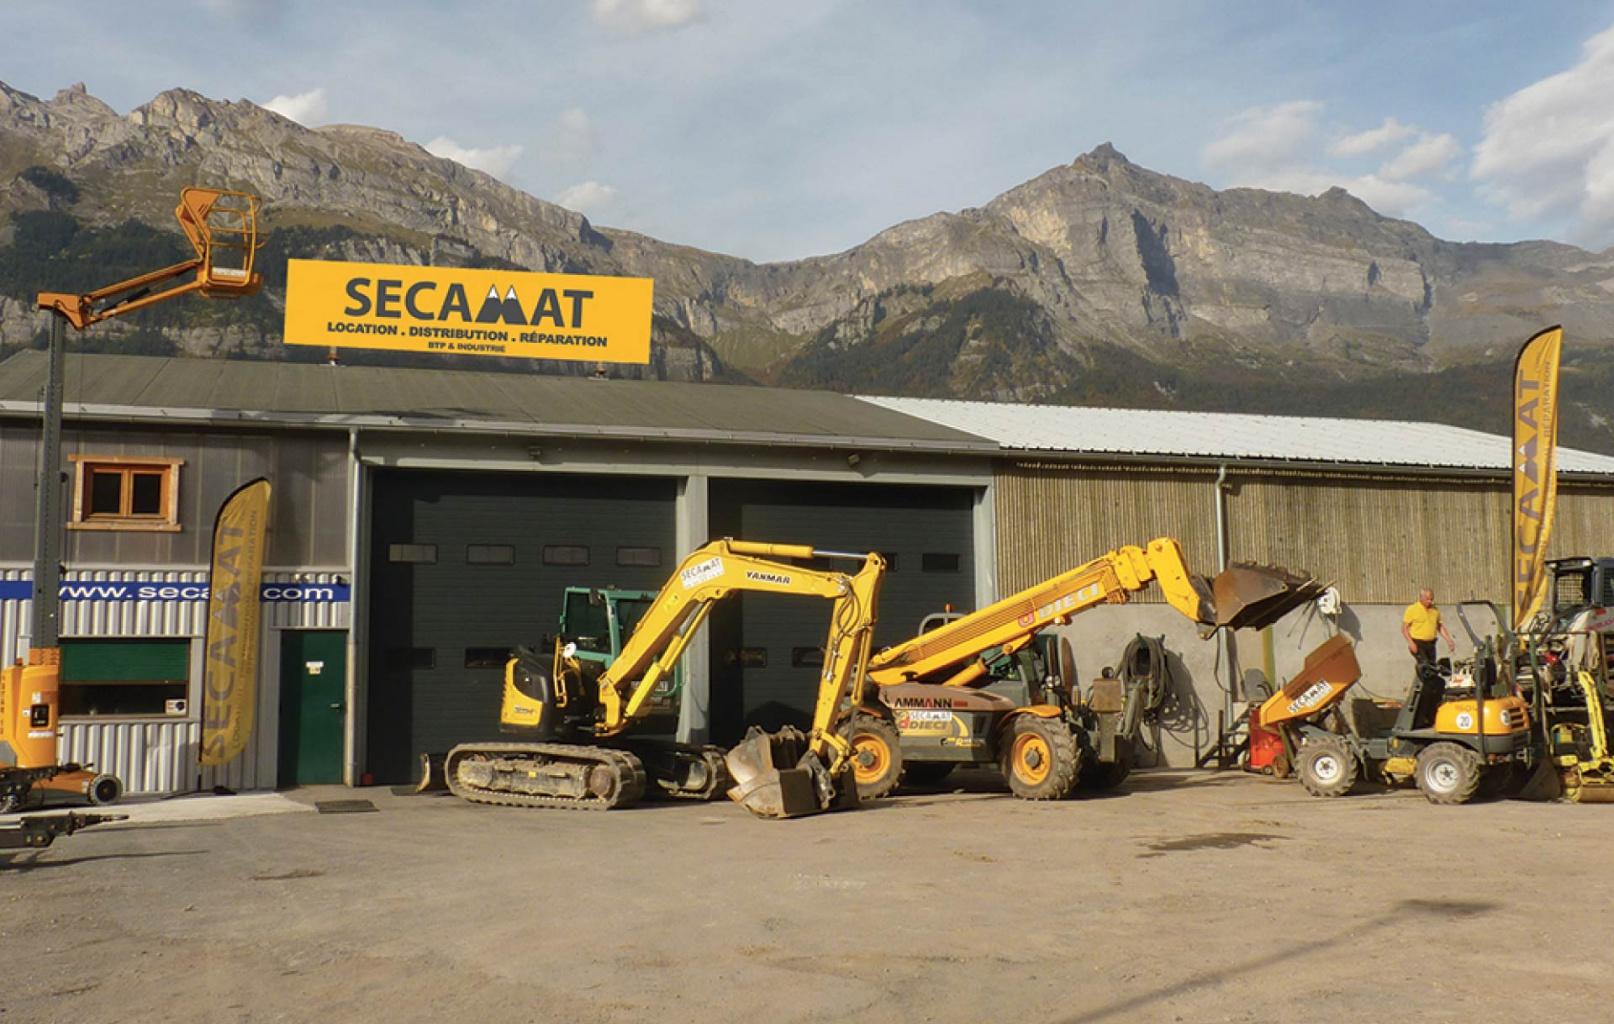 SECAMAT Passy Mont-Blanc